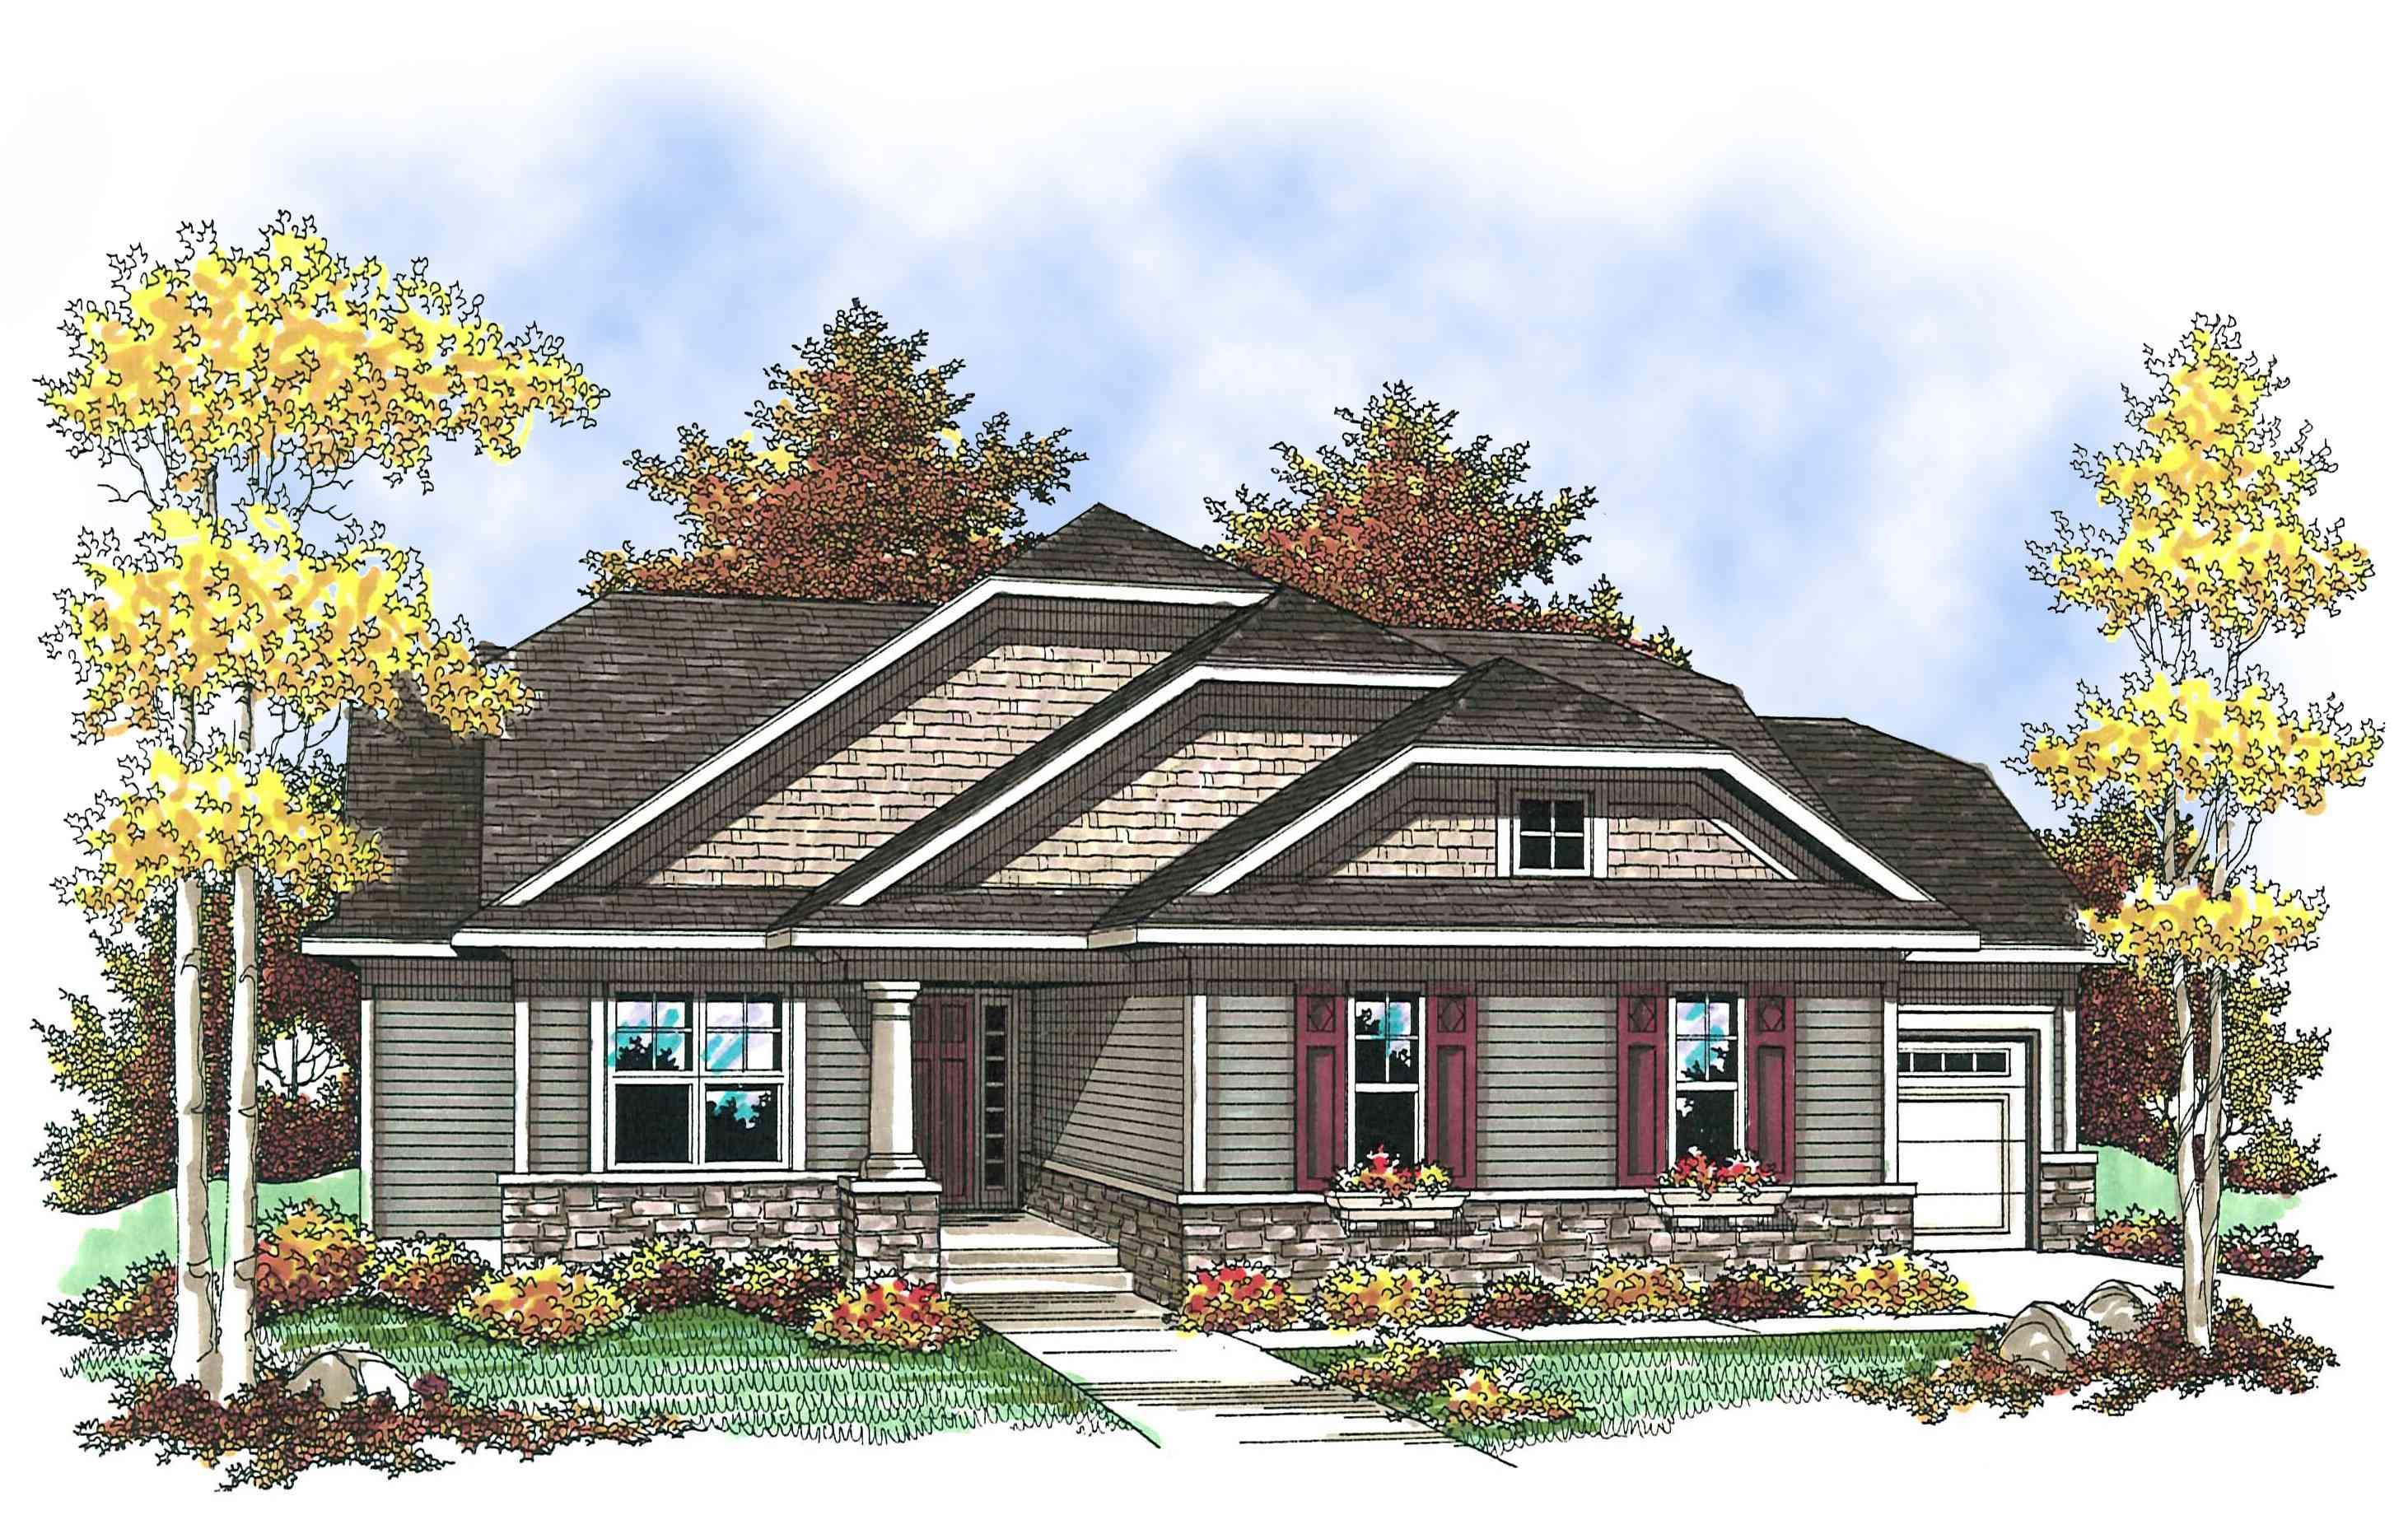 Craftsman With Open Floor Plan 89652ah Architectural